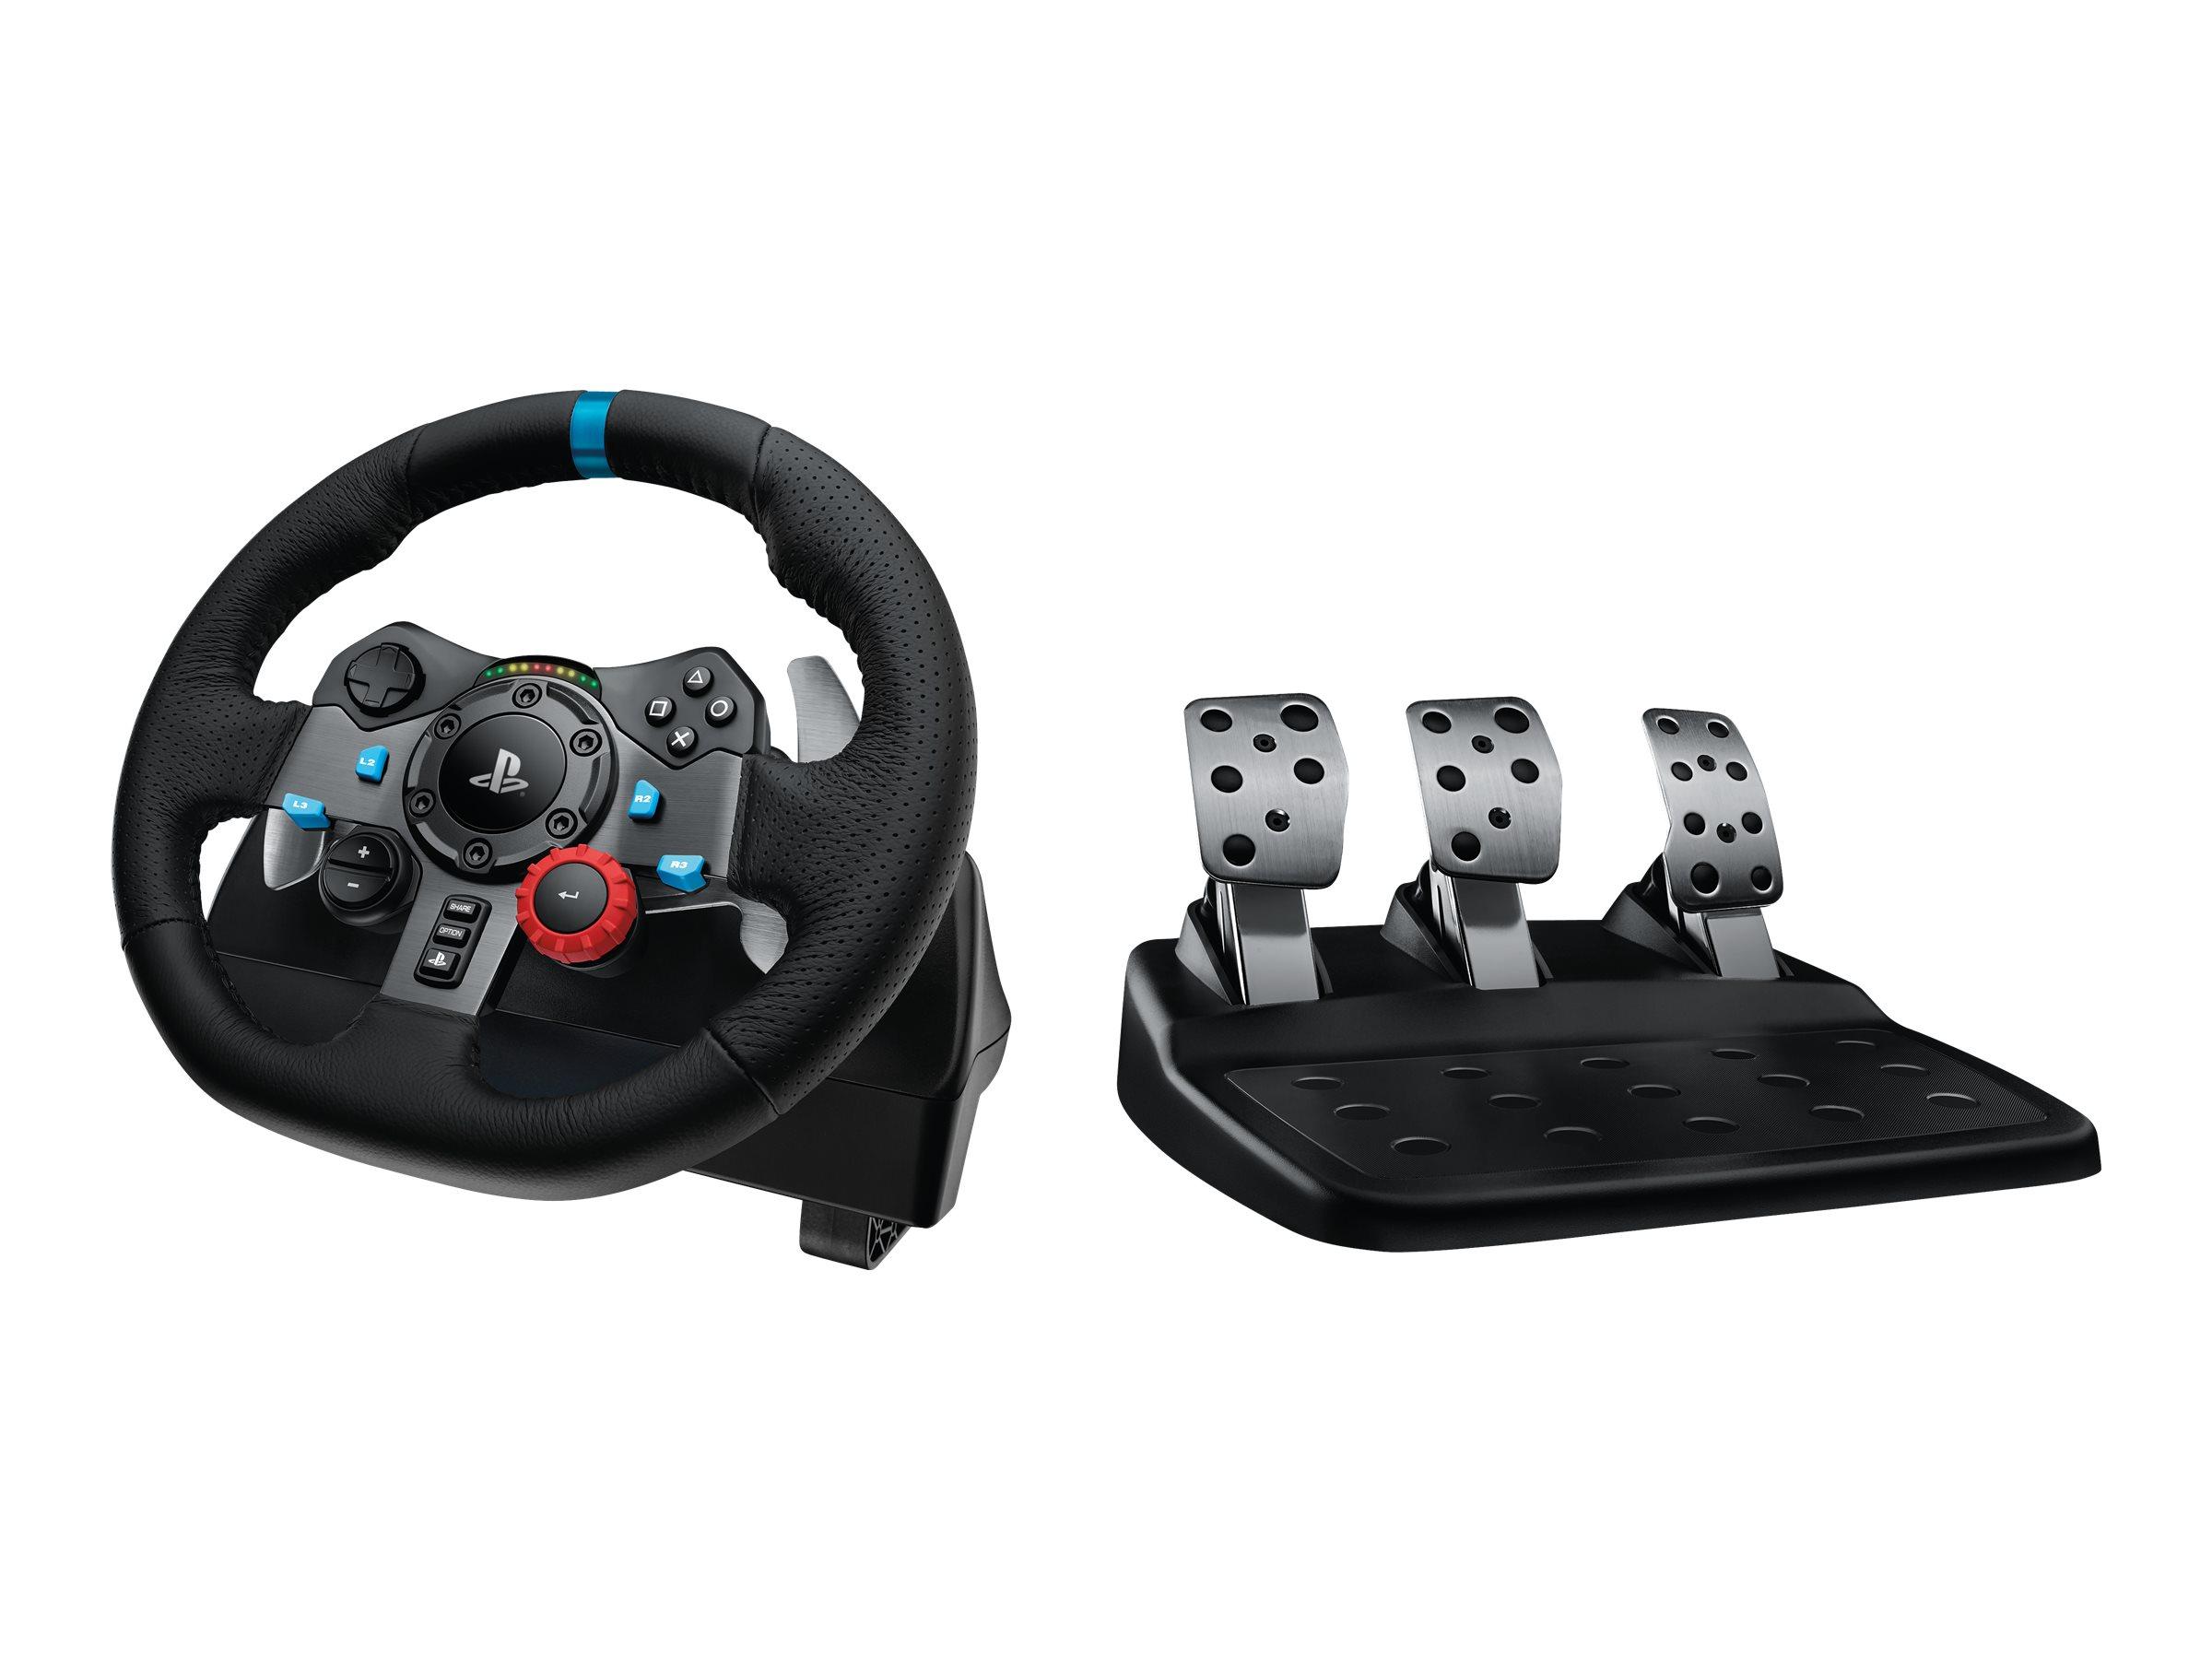 Logitech G29 Driving Force - Lenkrad- und Pedale-Set - kabelgebunden - für Sony PlayStation 3, Sony PlayStation 4